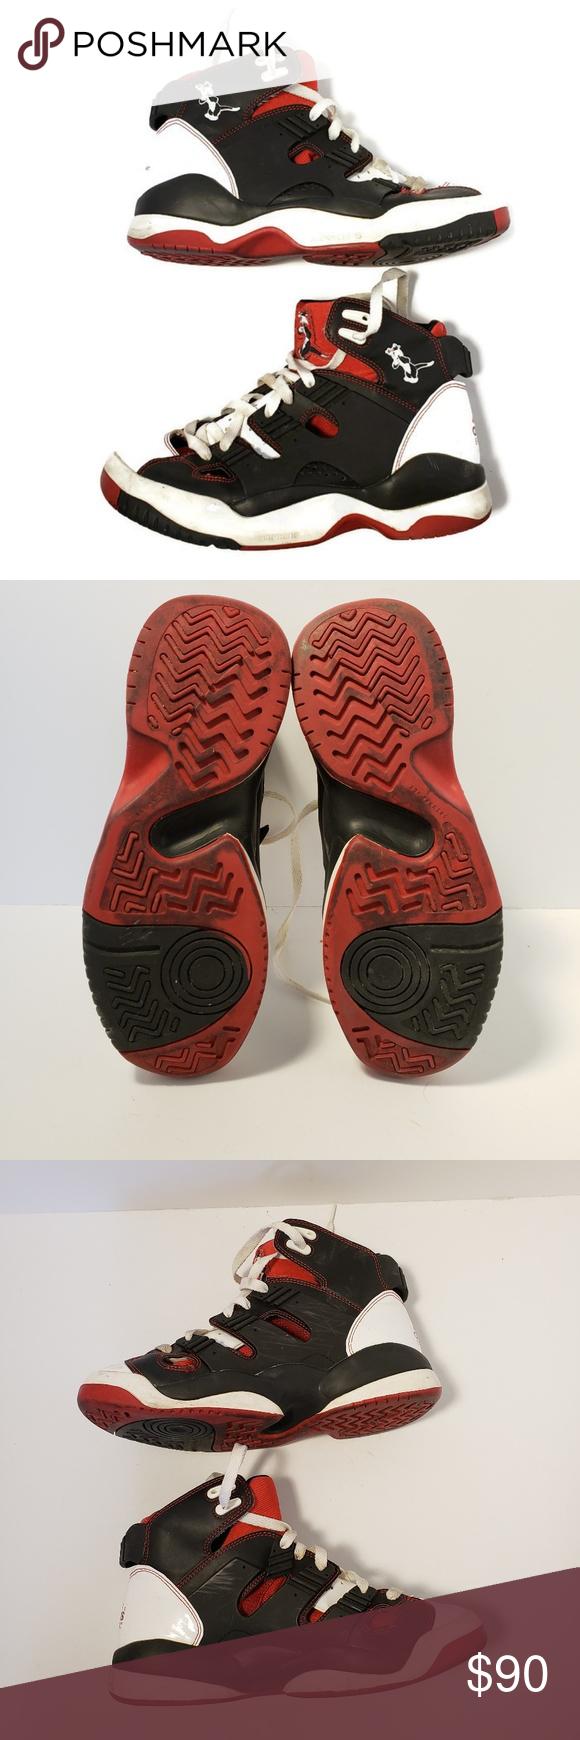 Adidas Sylvester Looney Tunes high top sneaker | Top sneakers ...